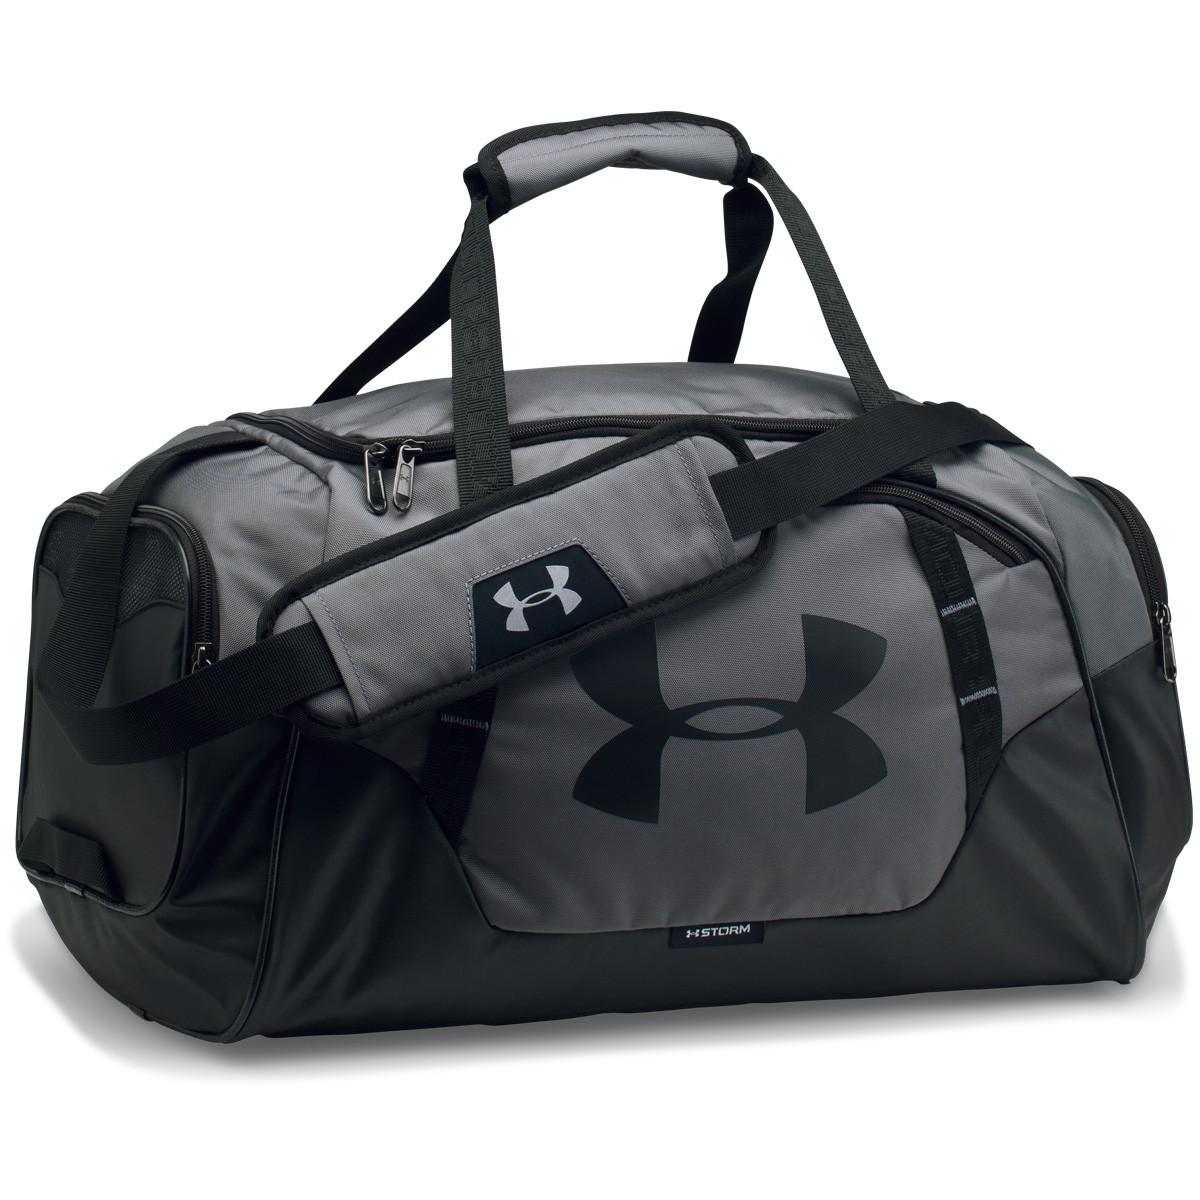 e9684aa2dd9a Under Armour Unisex 2019 UA Undeniable Duffle 3.0 SM Bag